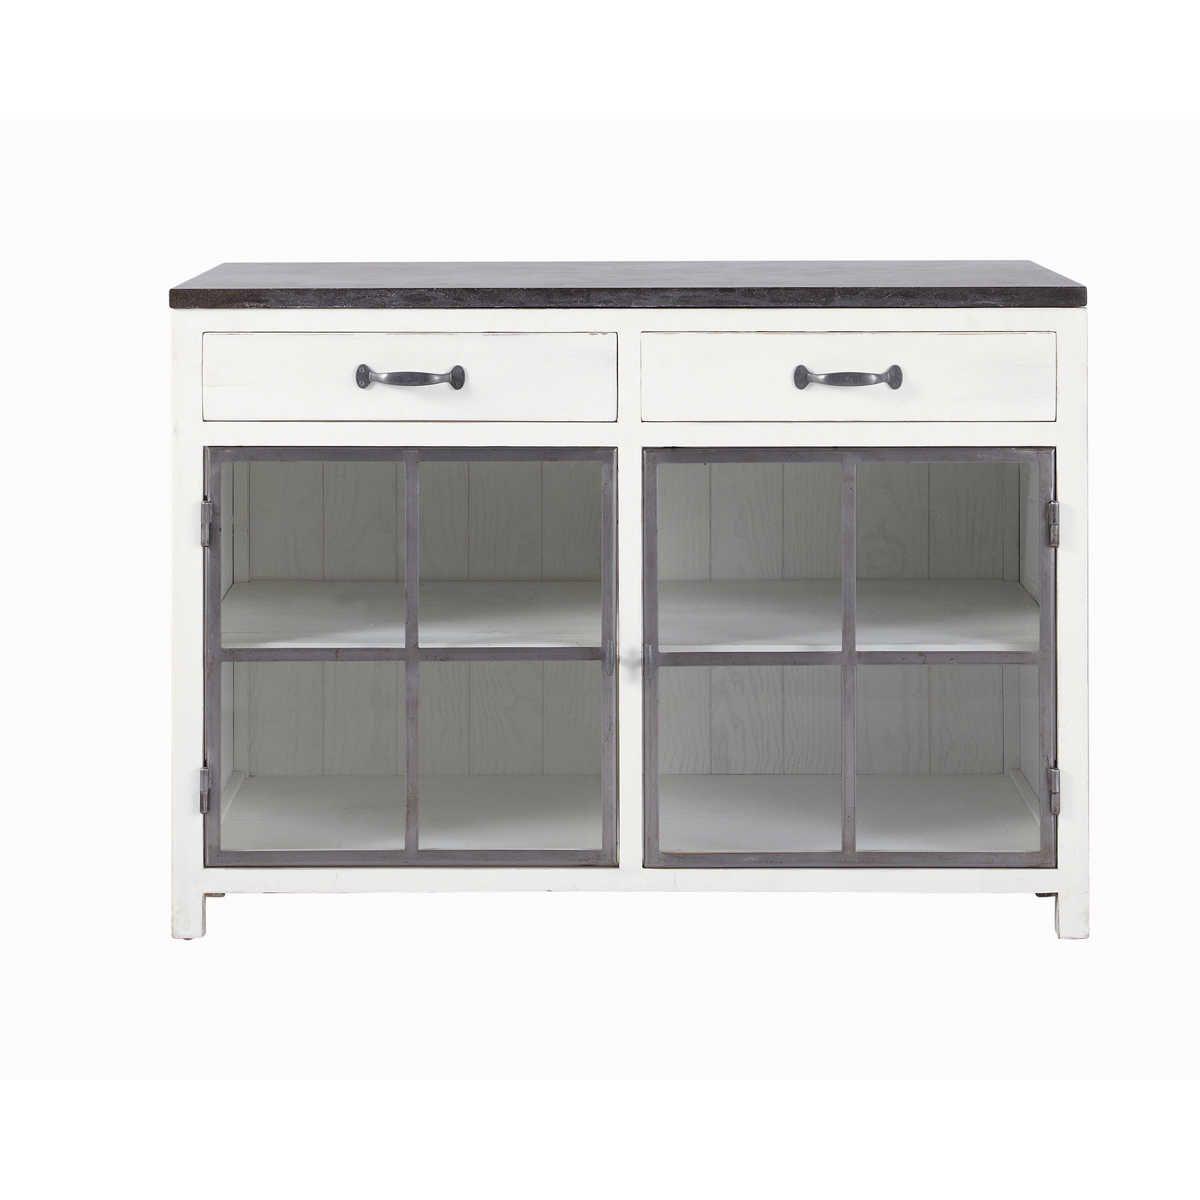 k chenunterschrank verglast ostende k che pinterest k che. Black Bedroom Furniture Sets. Home Design Ideas